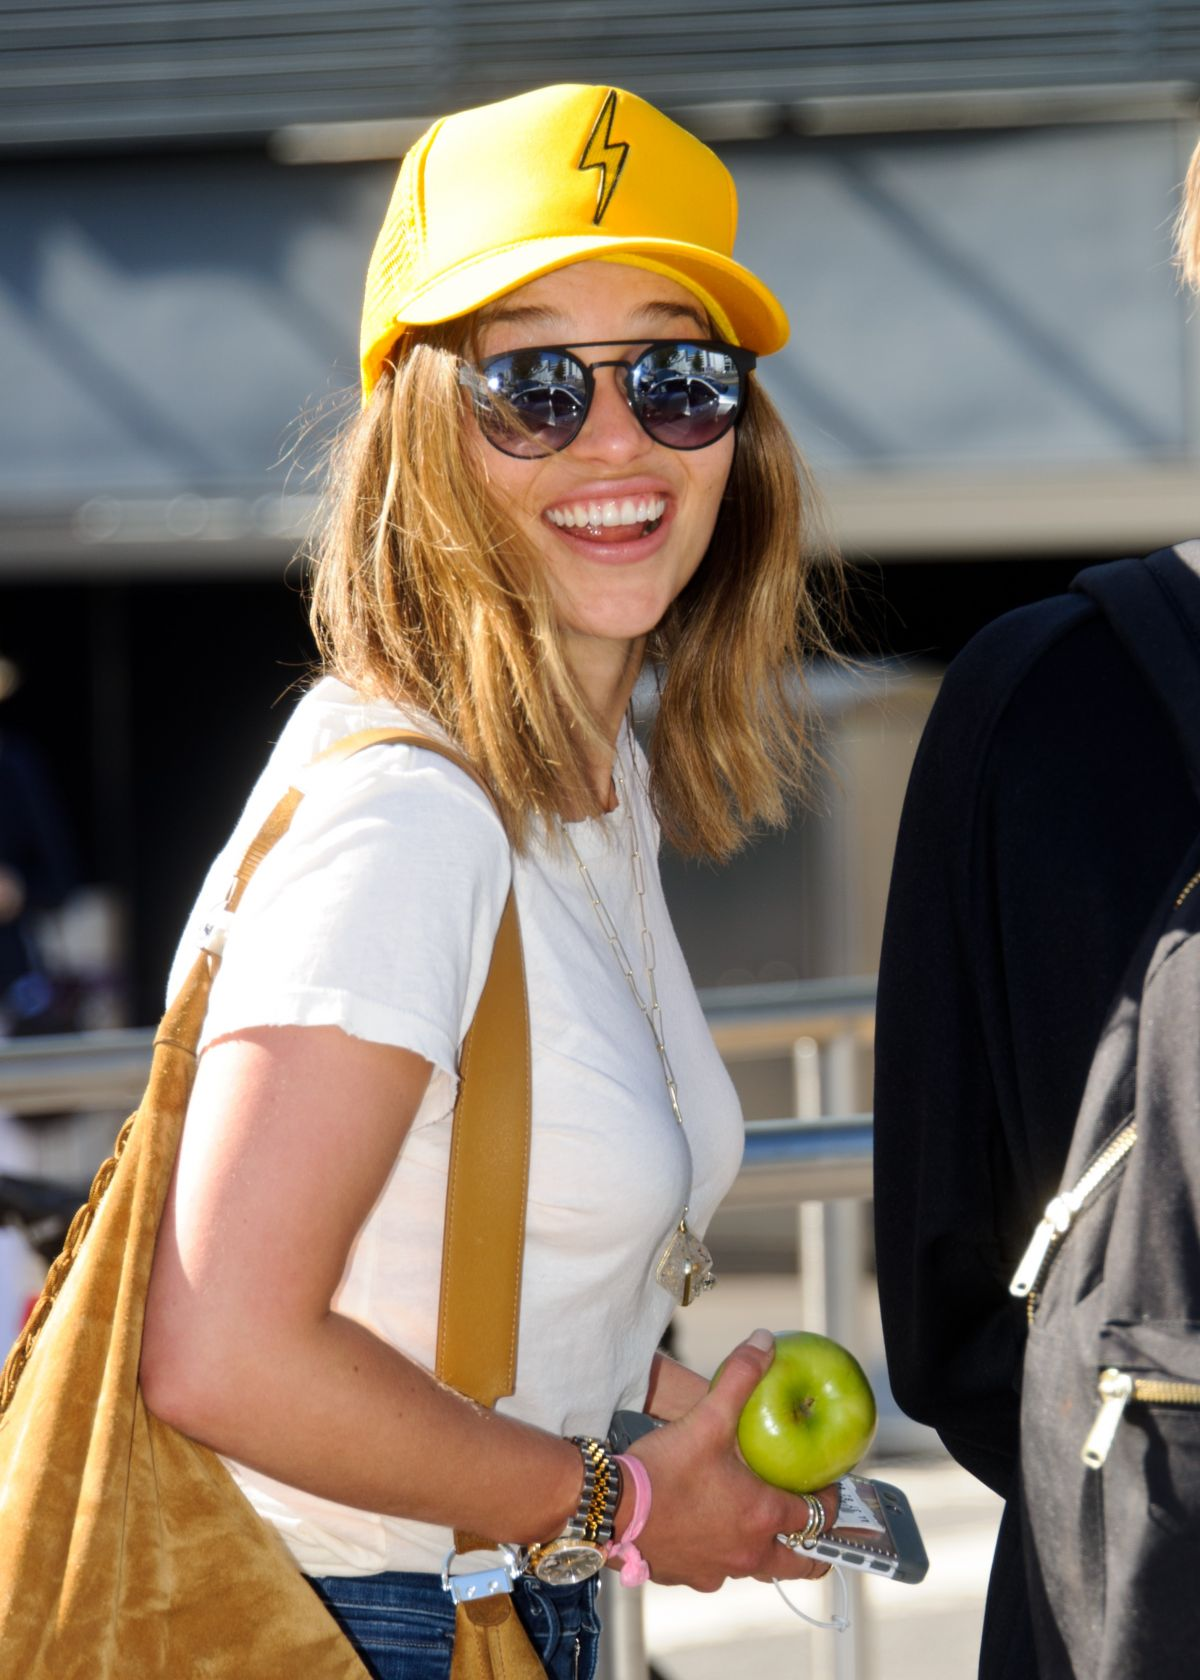 EMILIA CLARKE at Heathrow Airport in London 08/23/2016